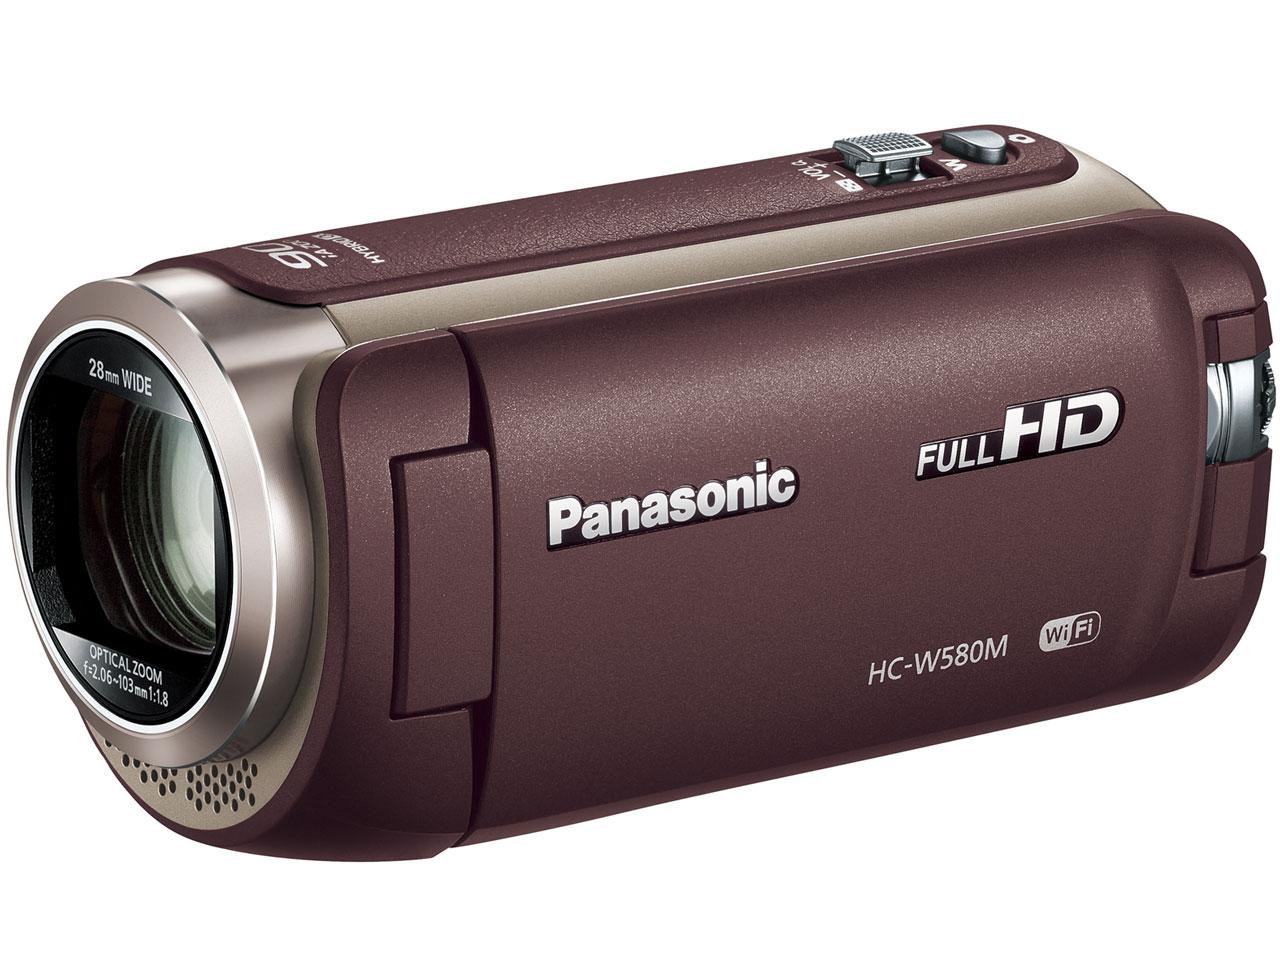 Panasonic HC-W580M